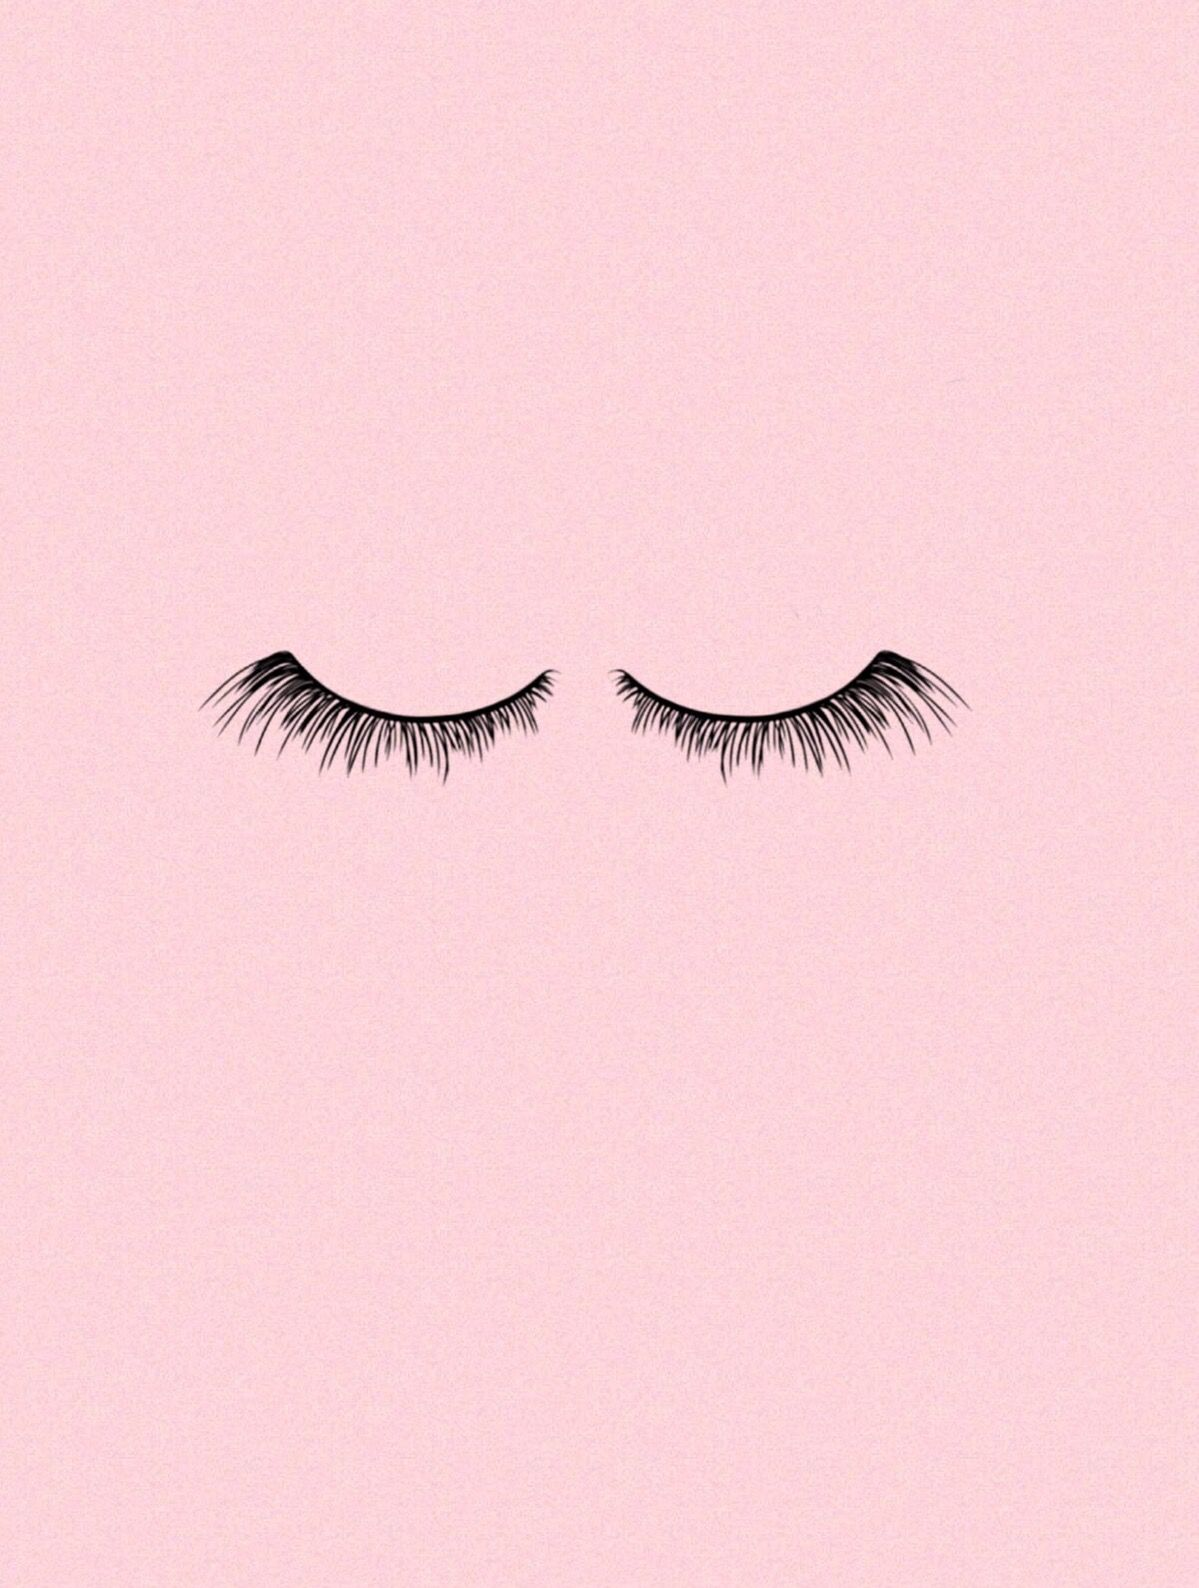 Rose Goldbaby Pink IPhone Wallpaperrosegoldlife